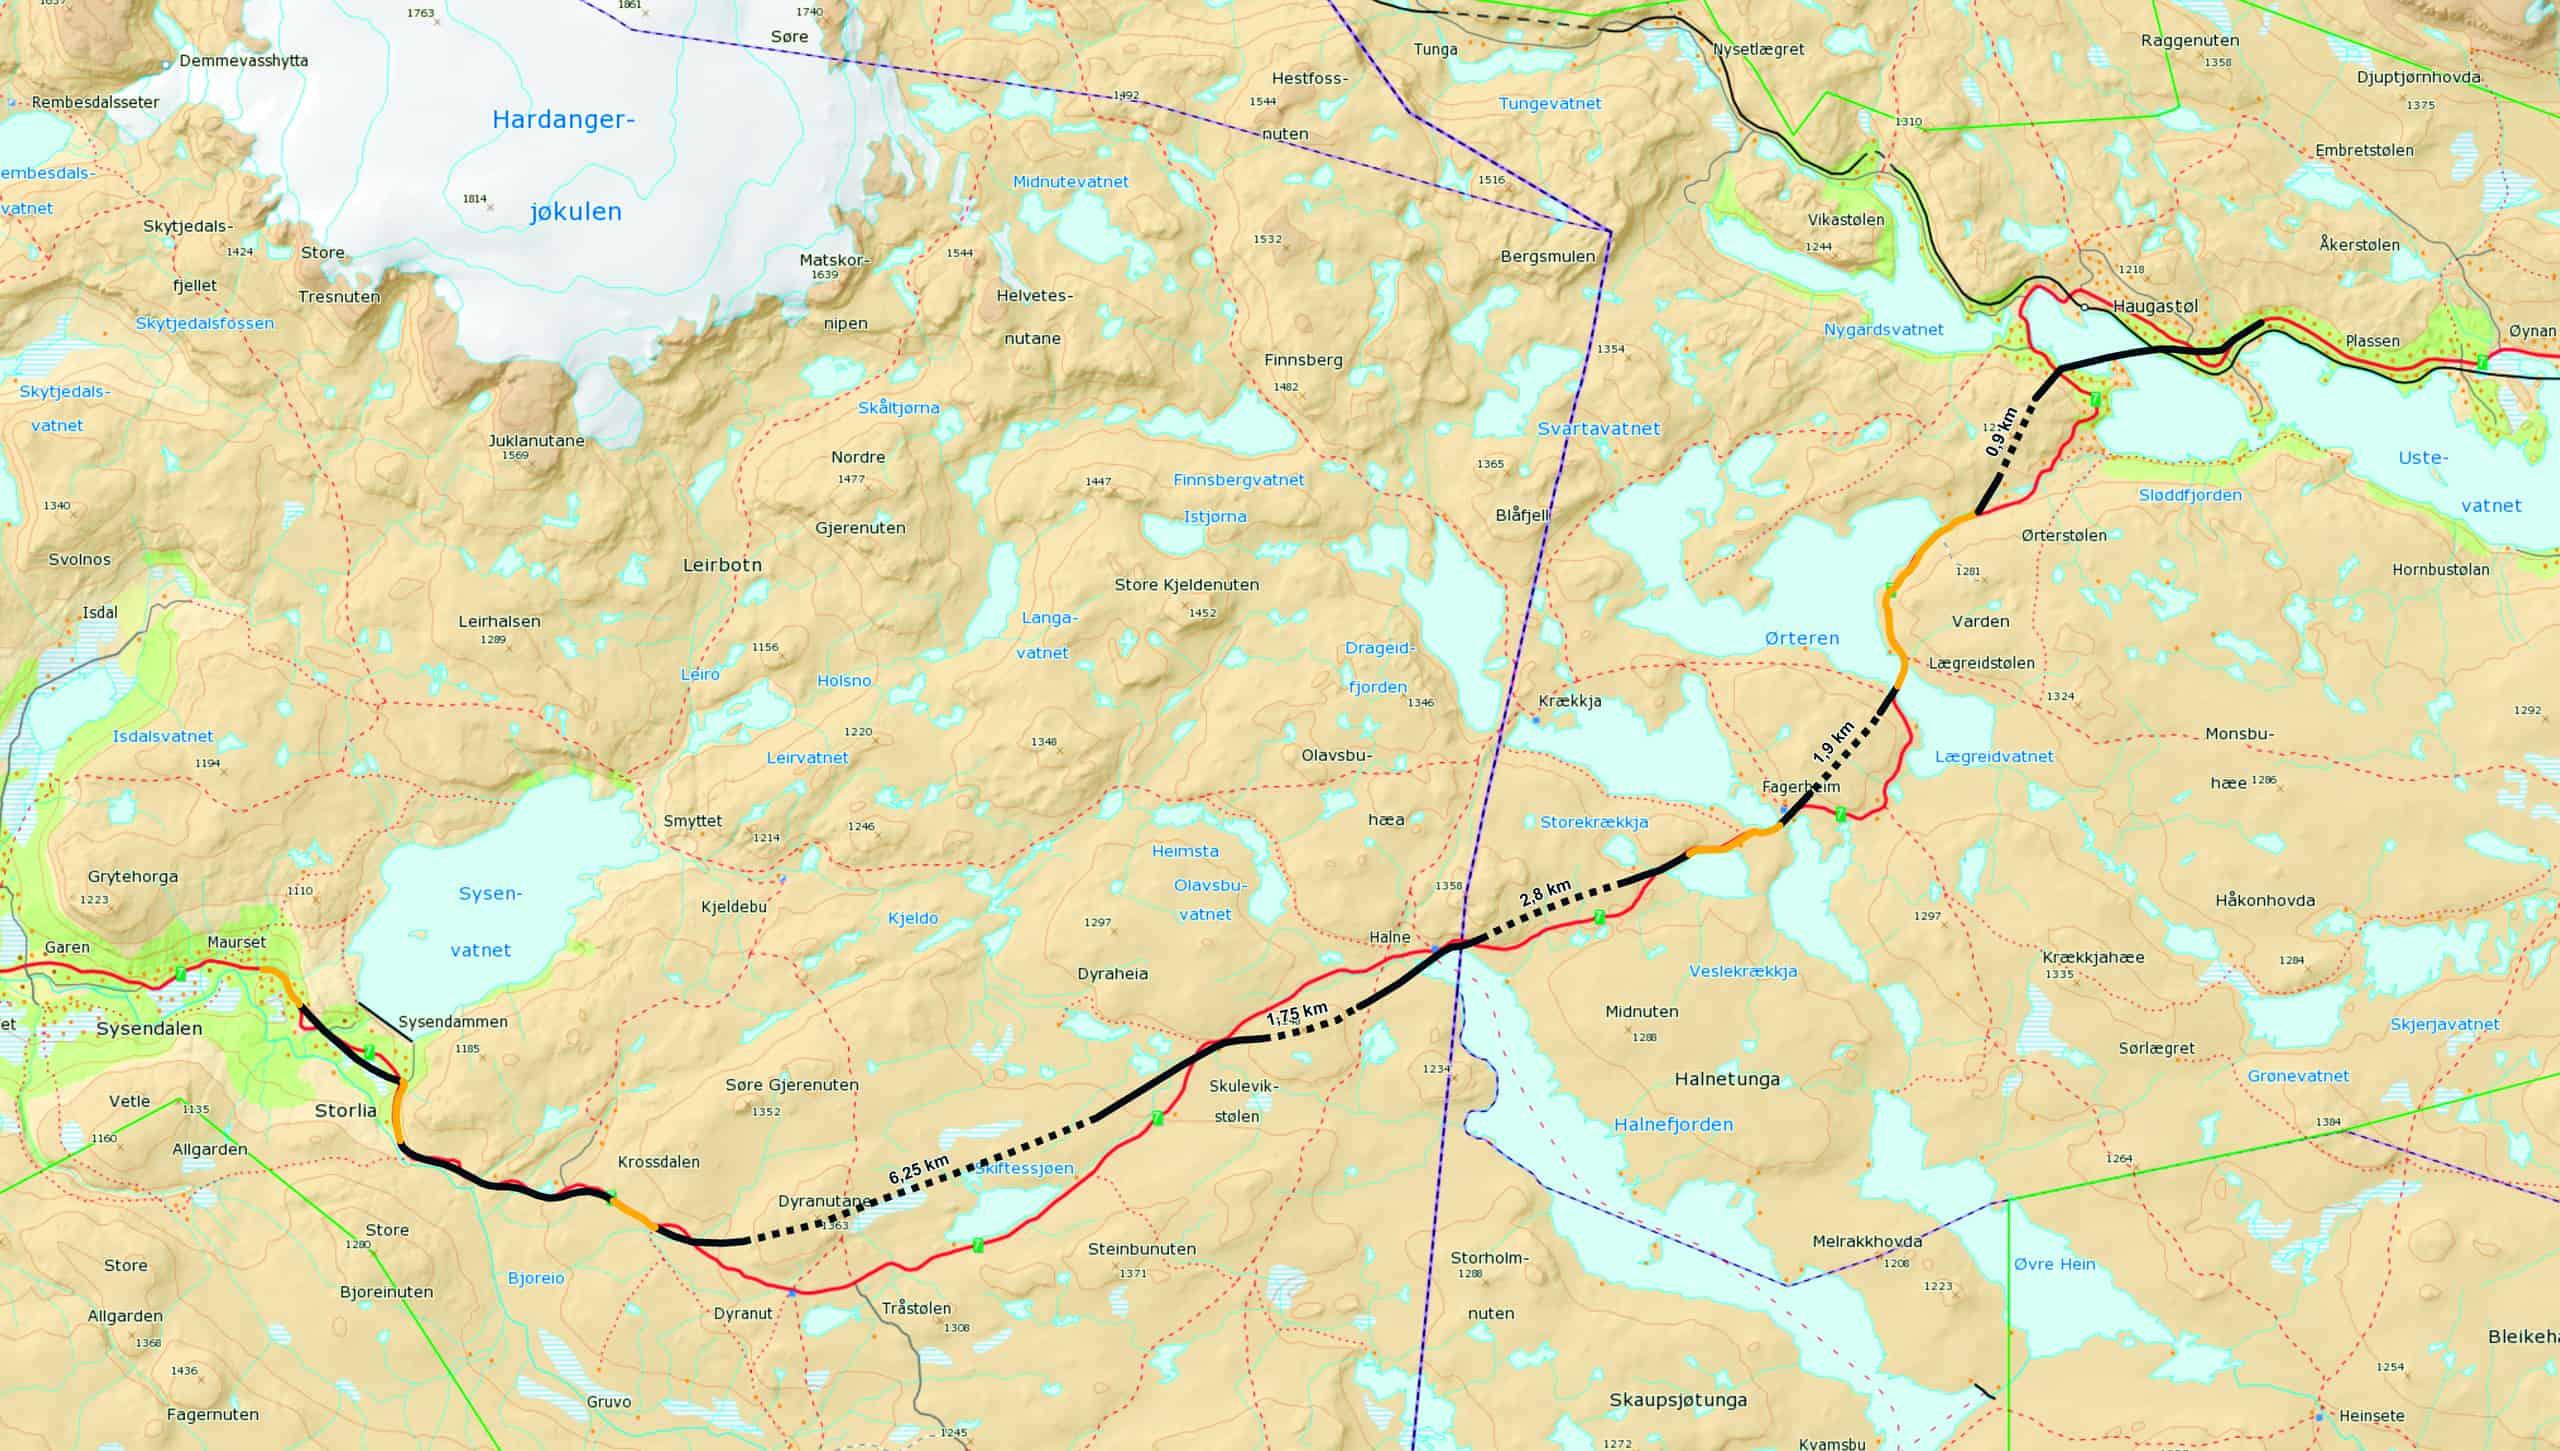 Uttale til «15/225843- KVU Rv 7 Hardangervidda -Ny høring»